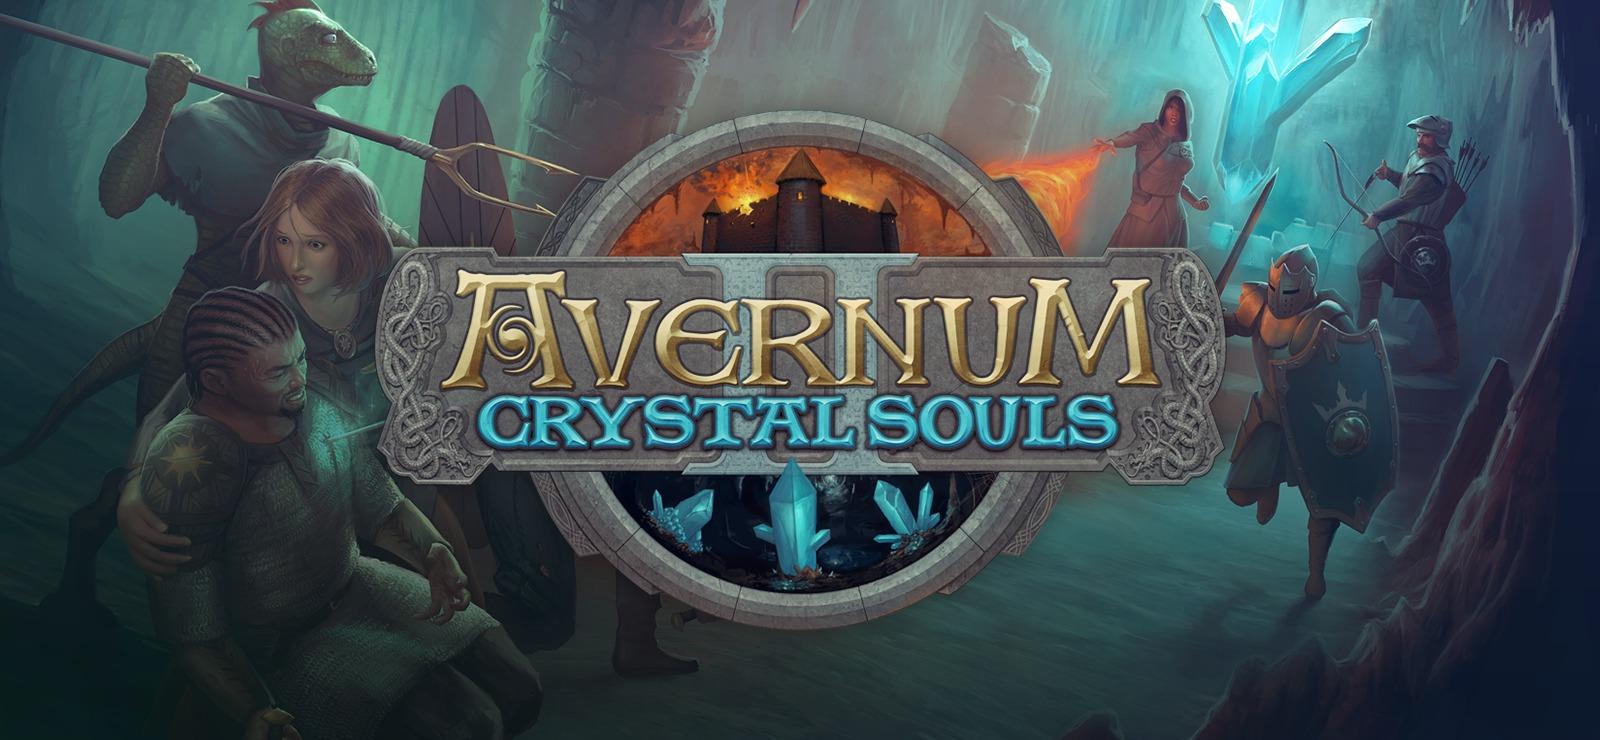 Avernum 2: Crystal Souls (2015)